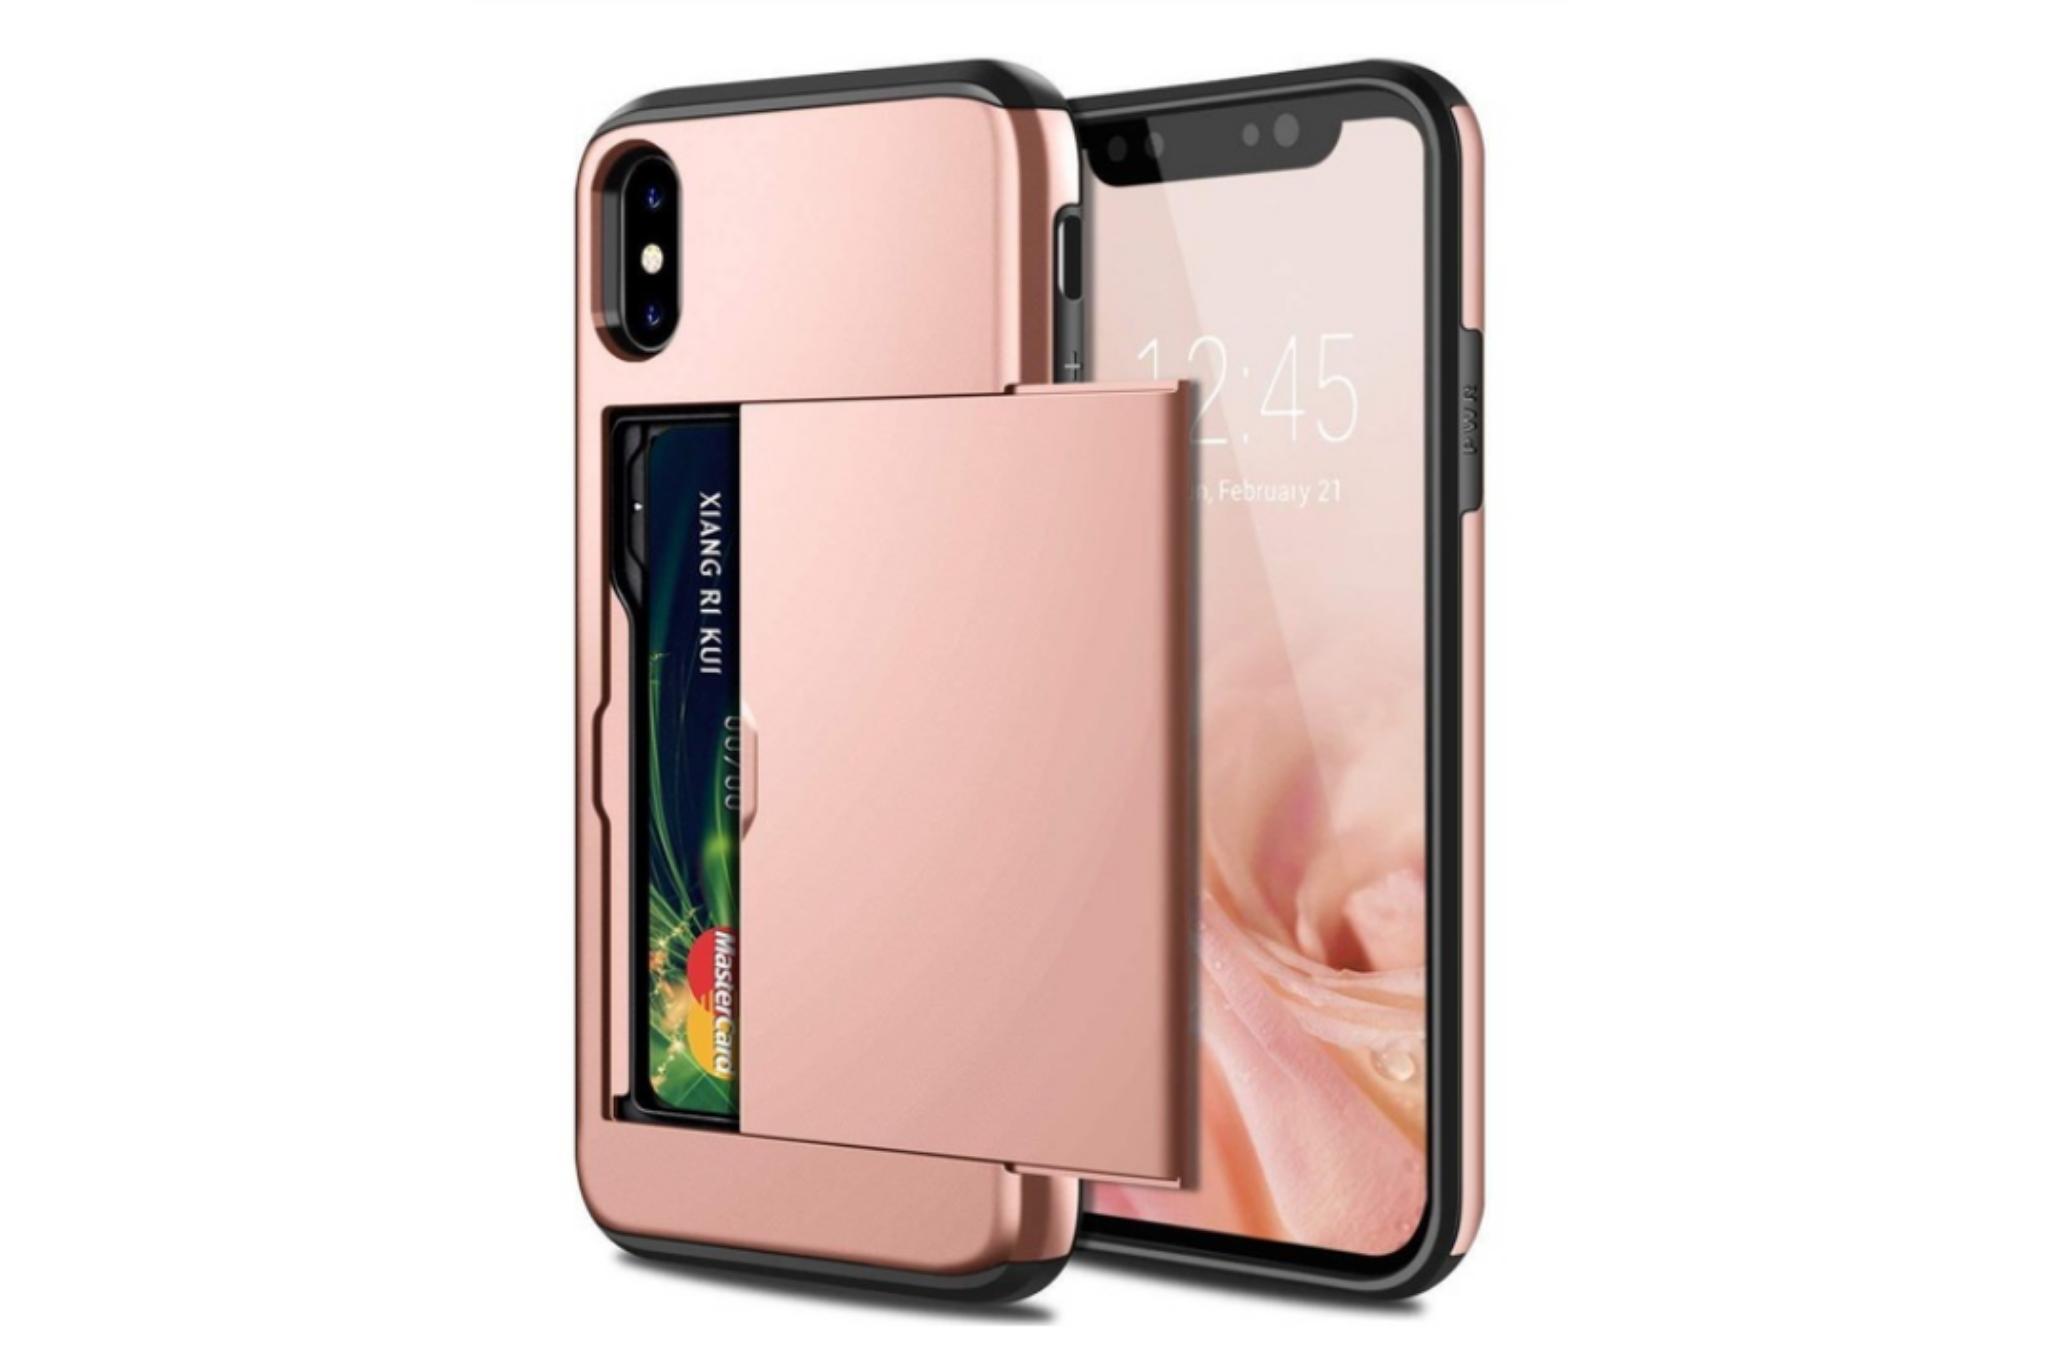 Smartphonehoesje iPhone 12 (Pro) | Pasjesschuif | Rose gold